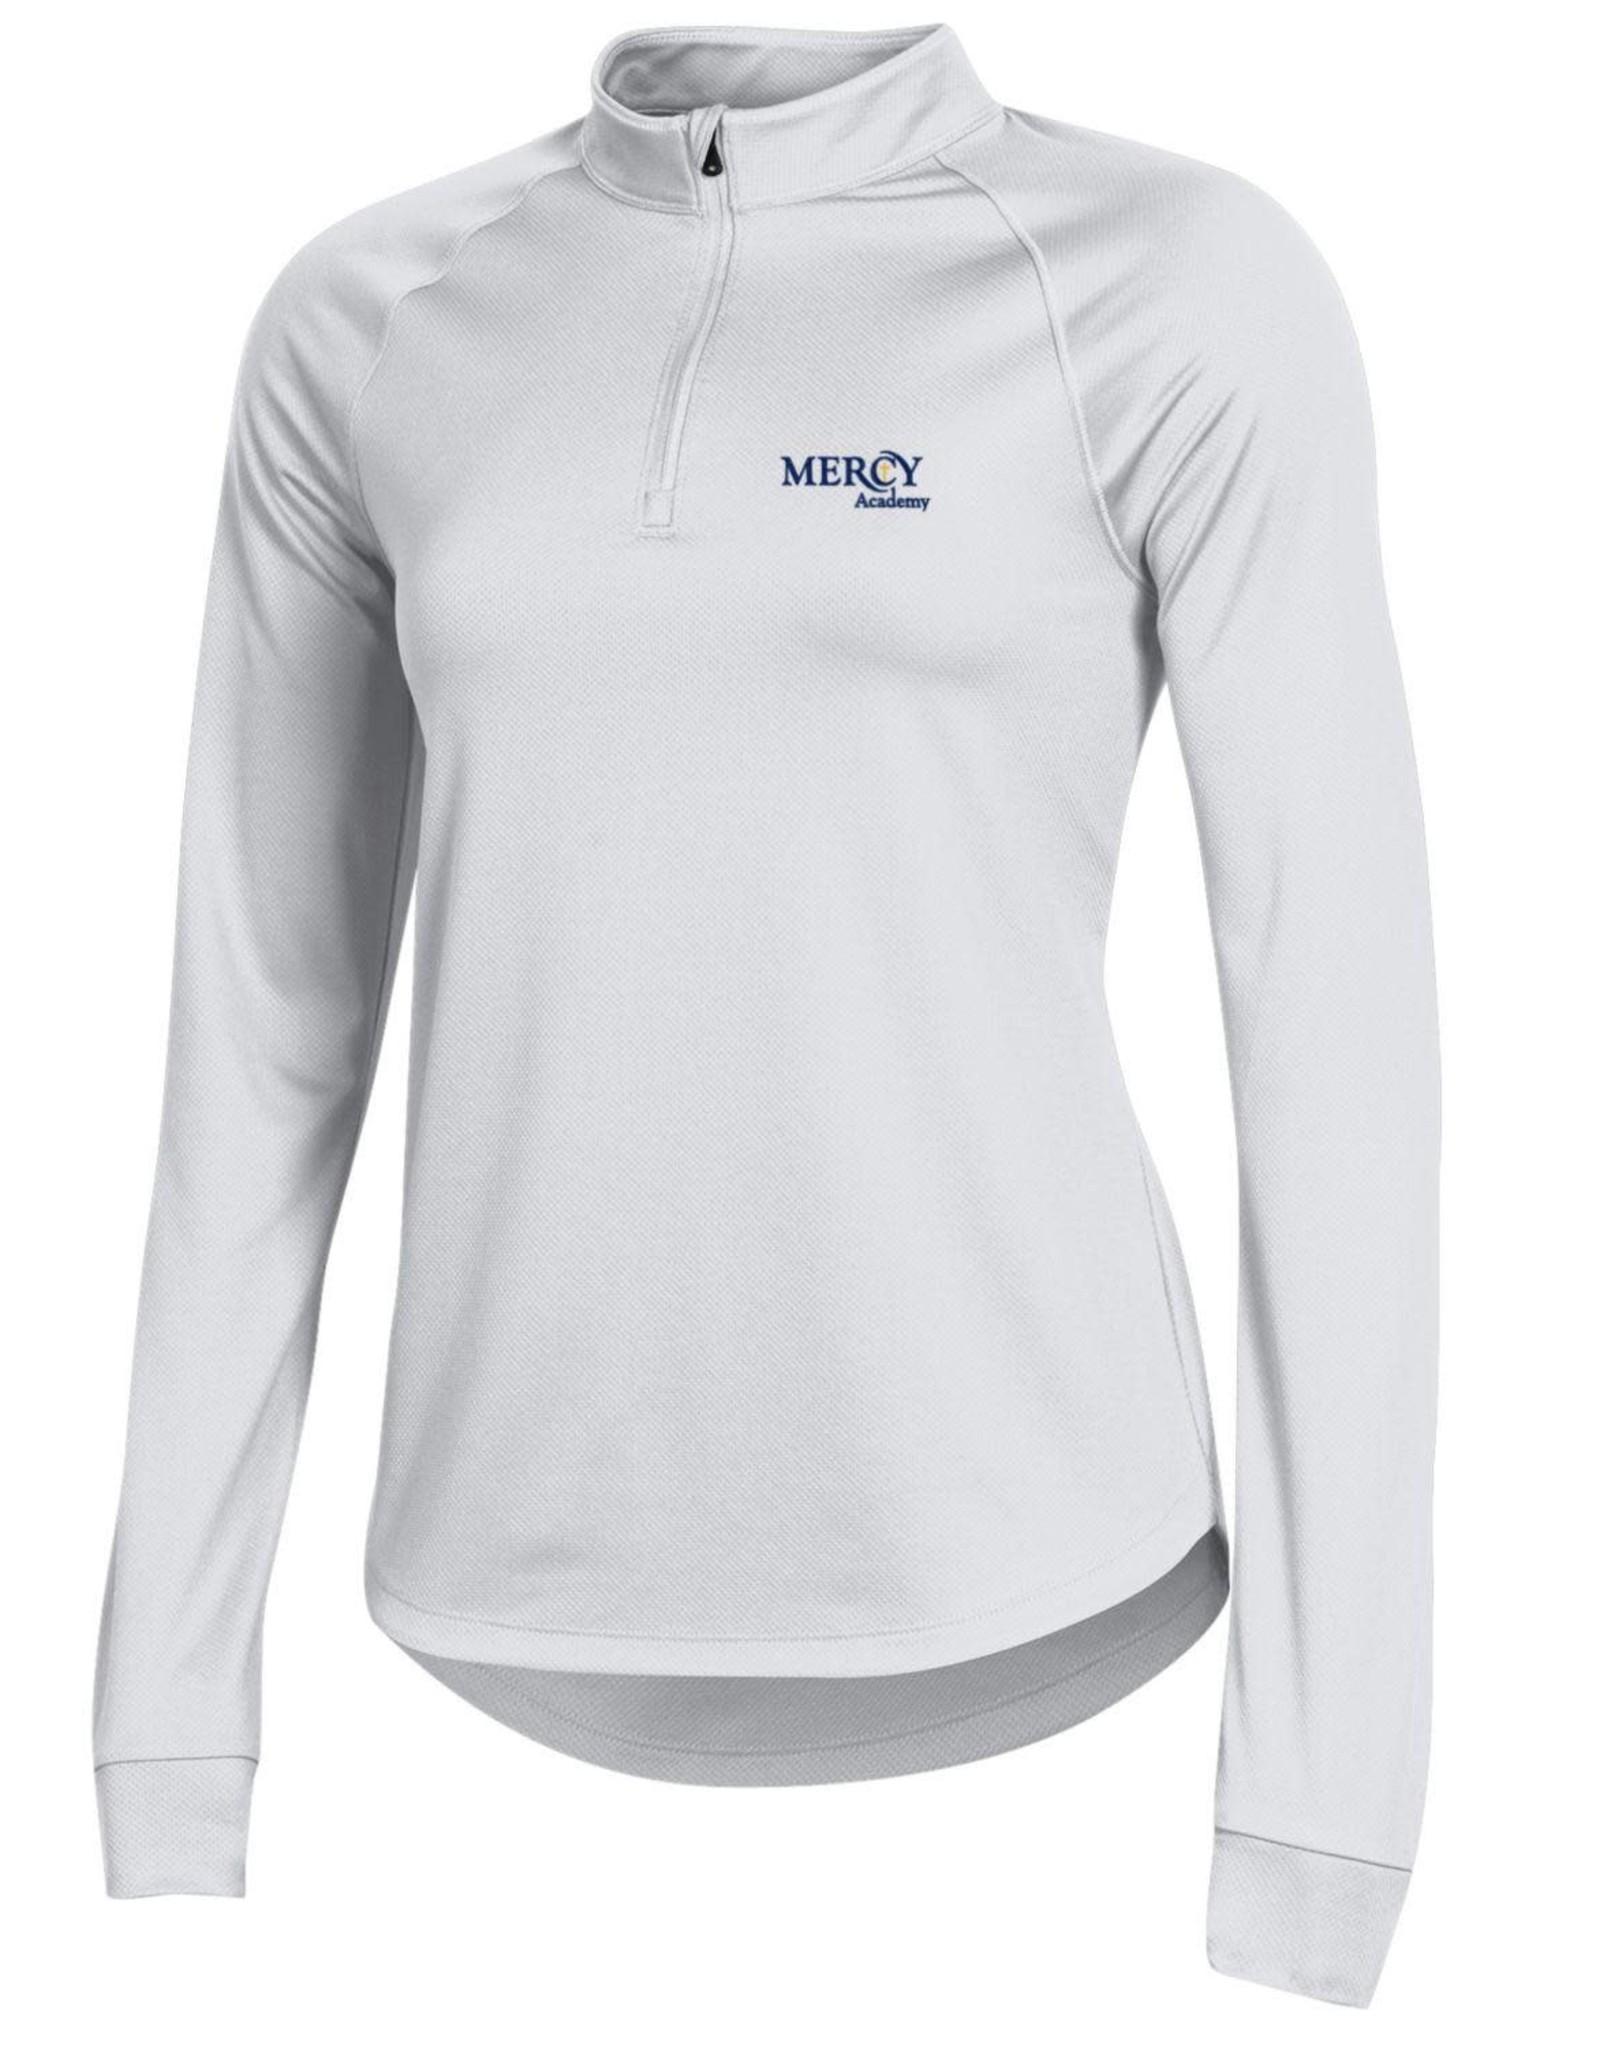 UNDER ARMOUR Uniform Under Armour Quarter Zip - White